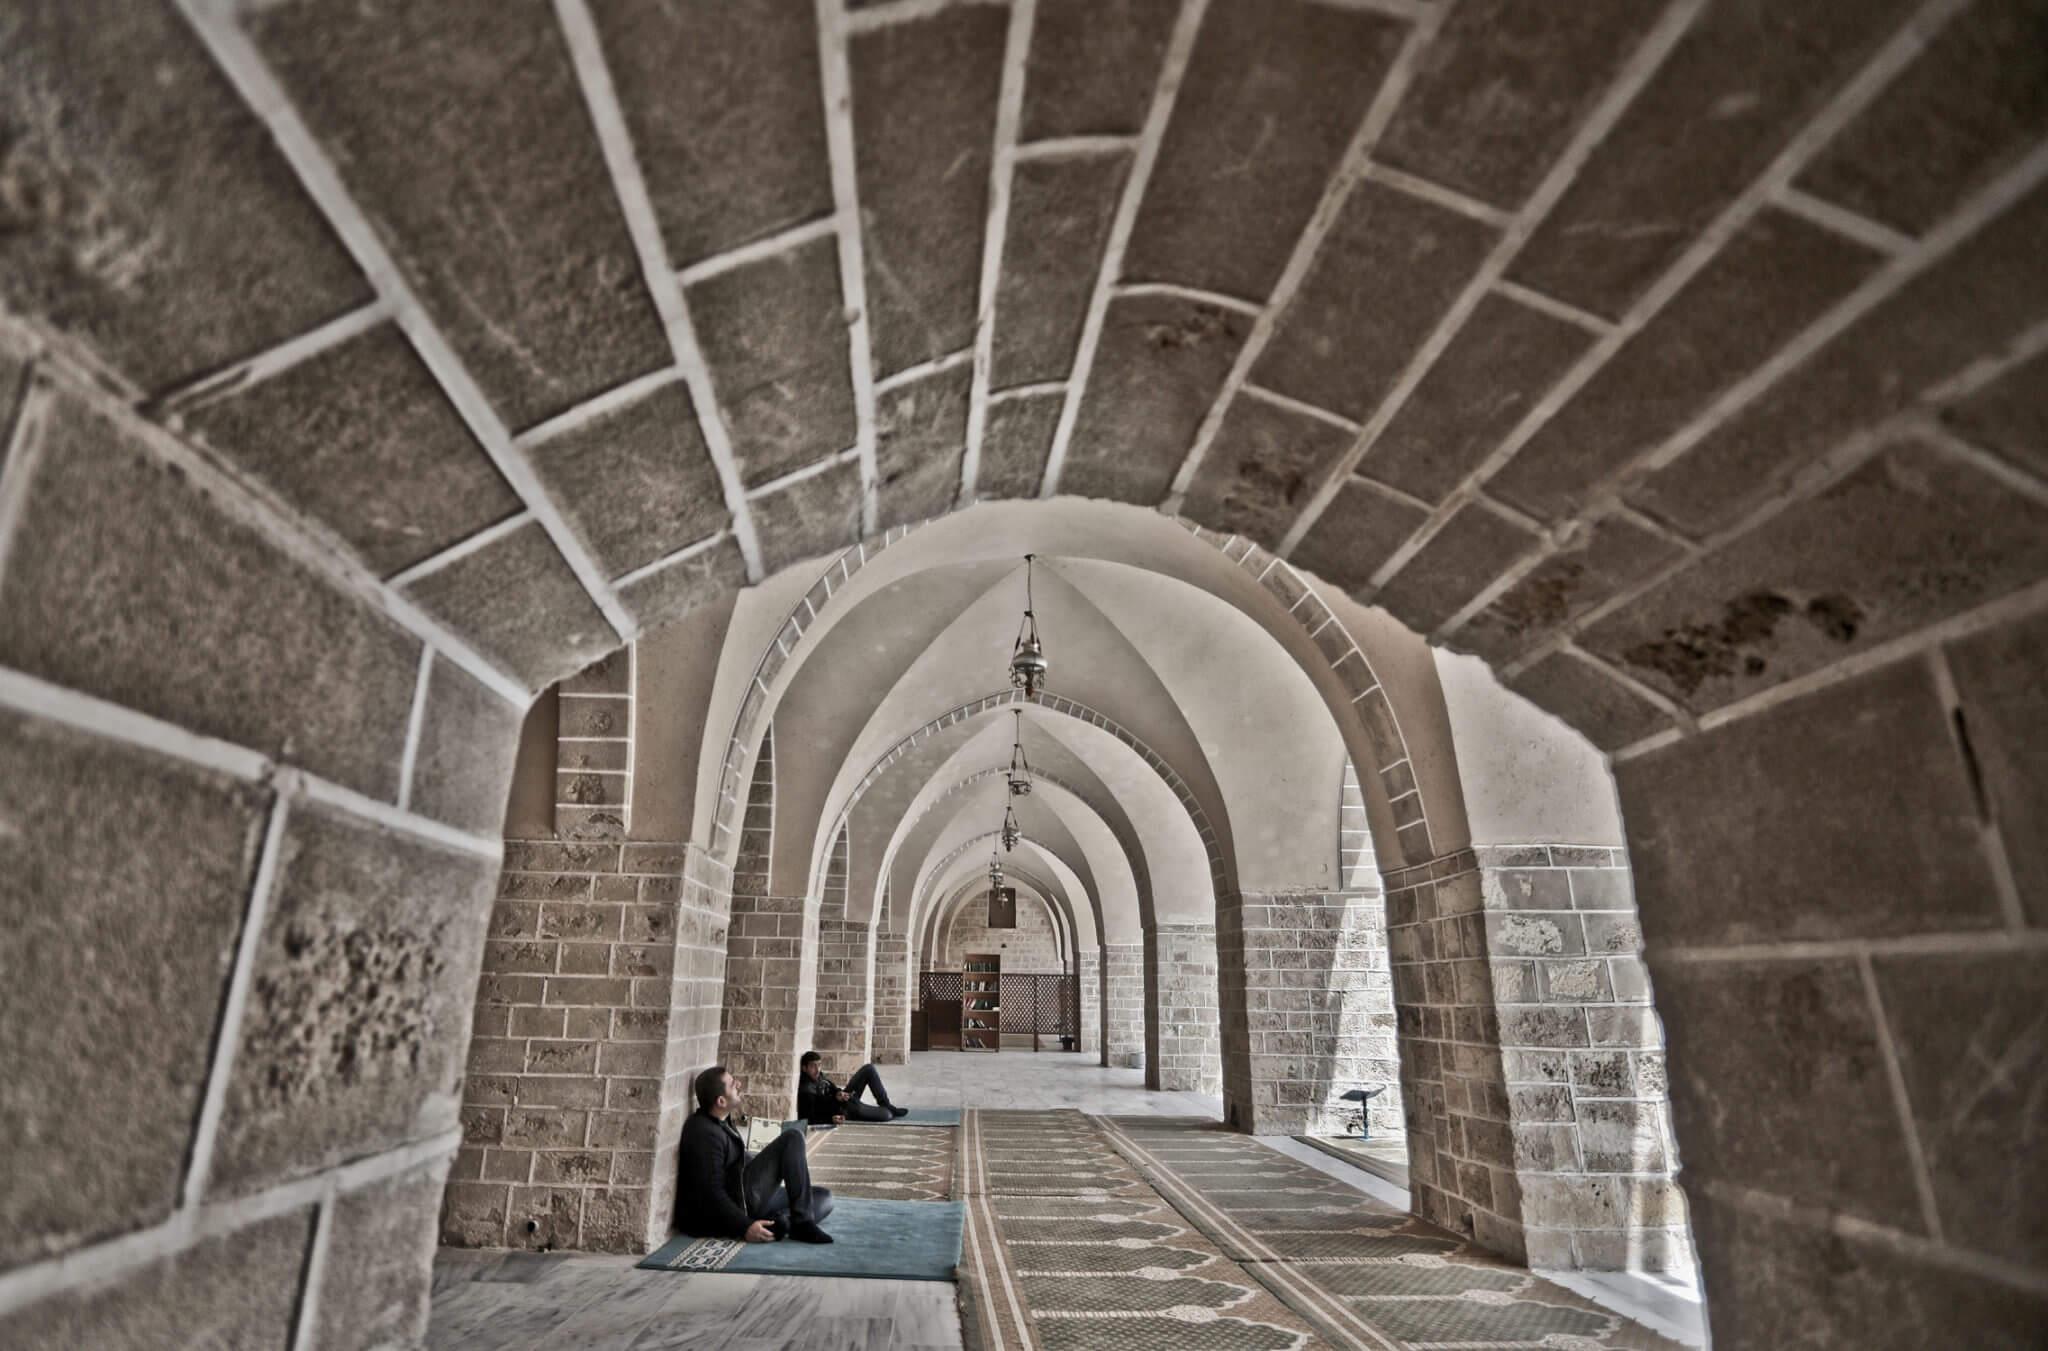 Worshippers in al-Omari mosque